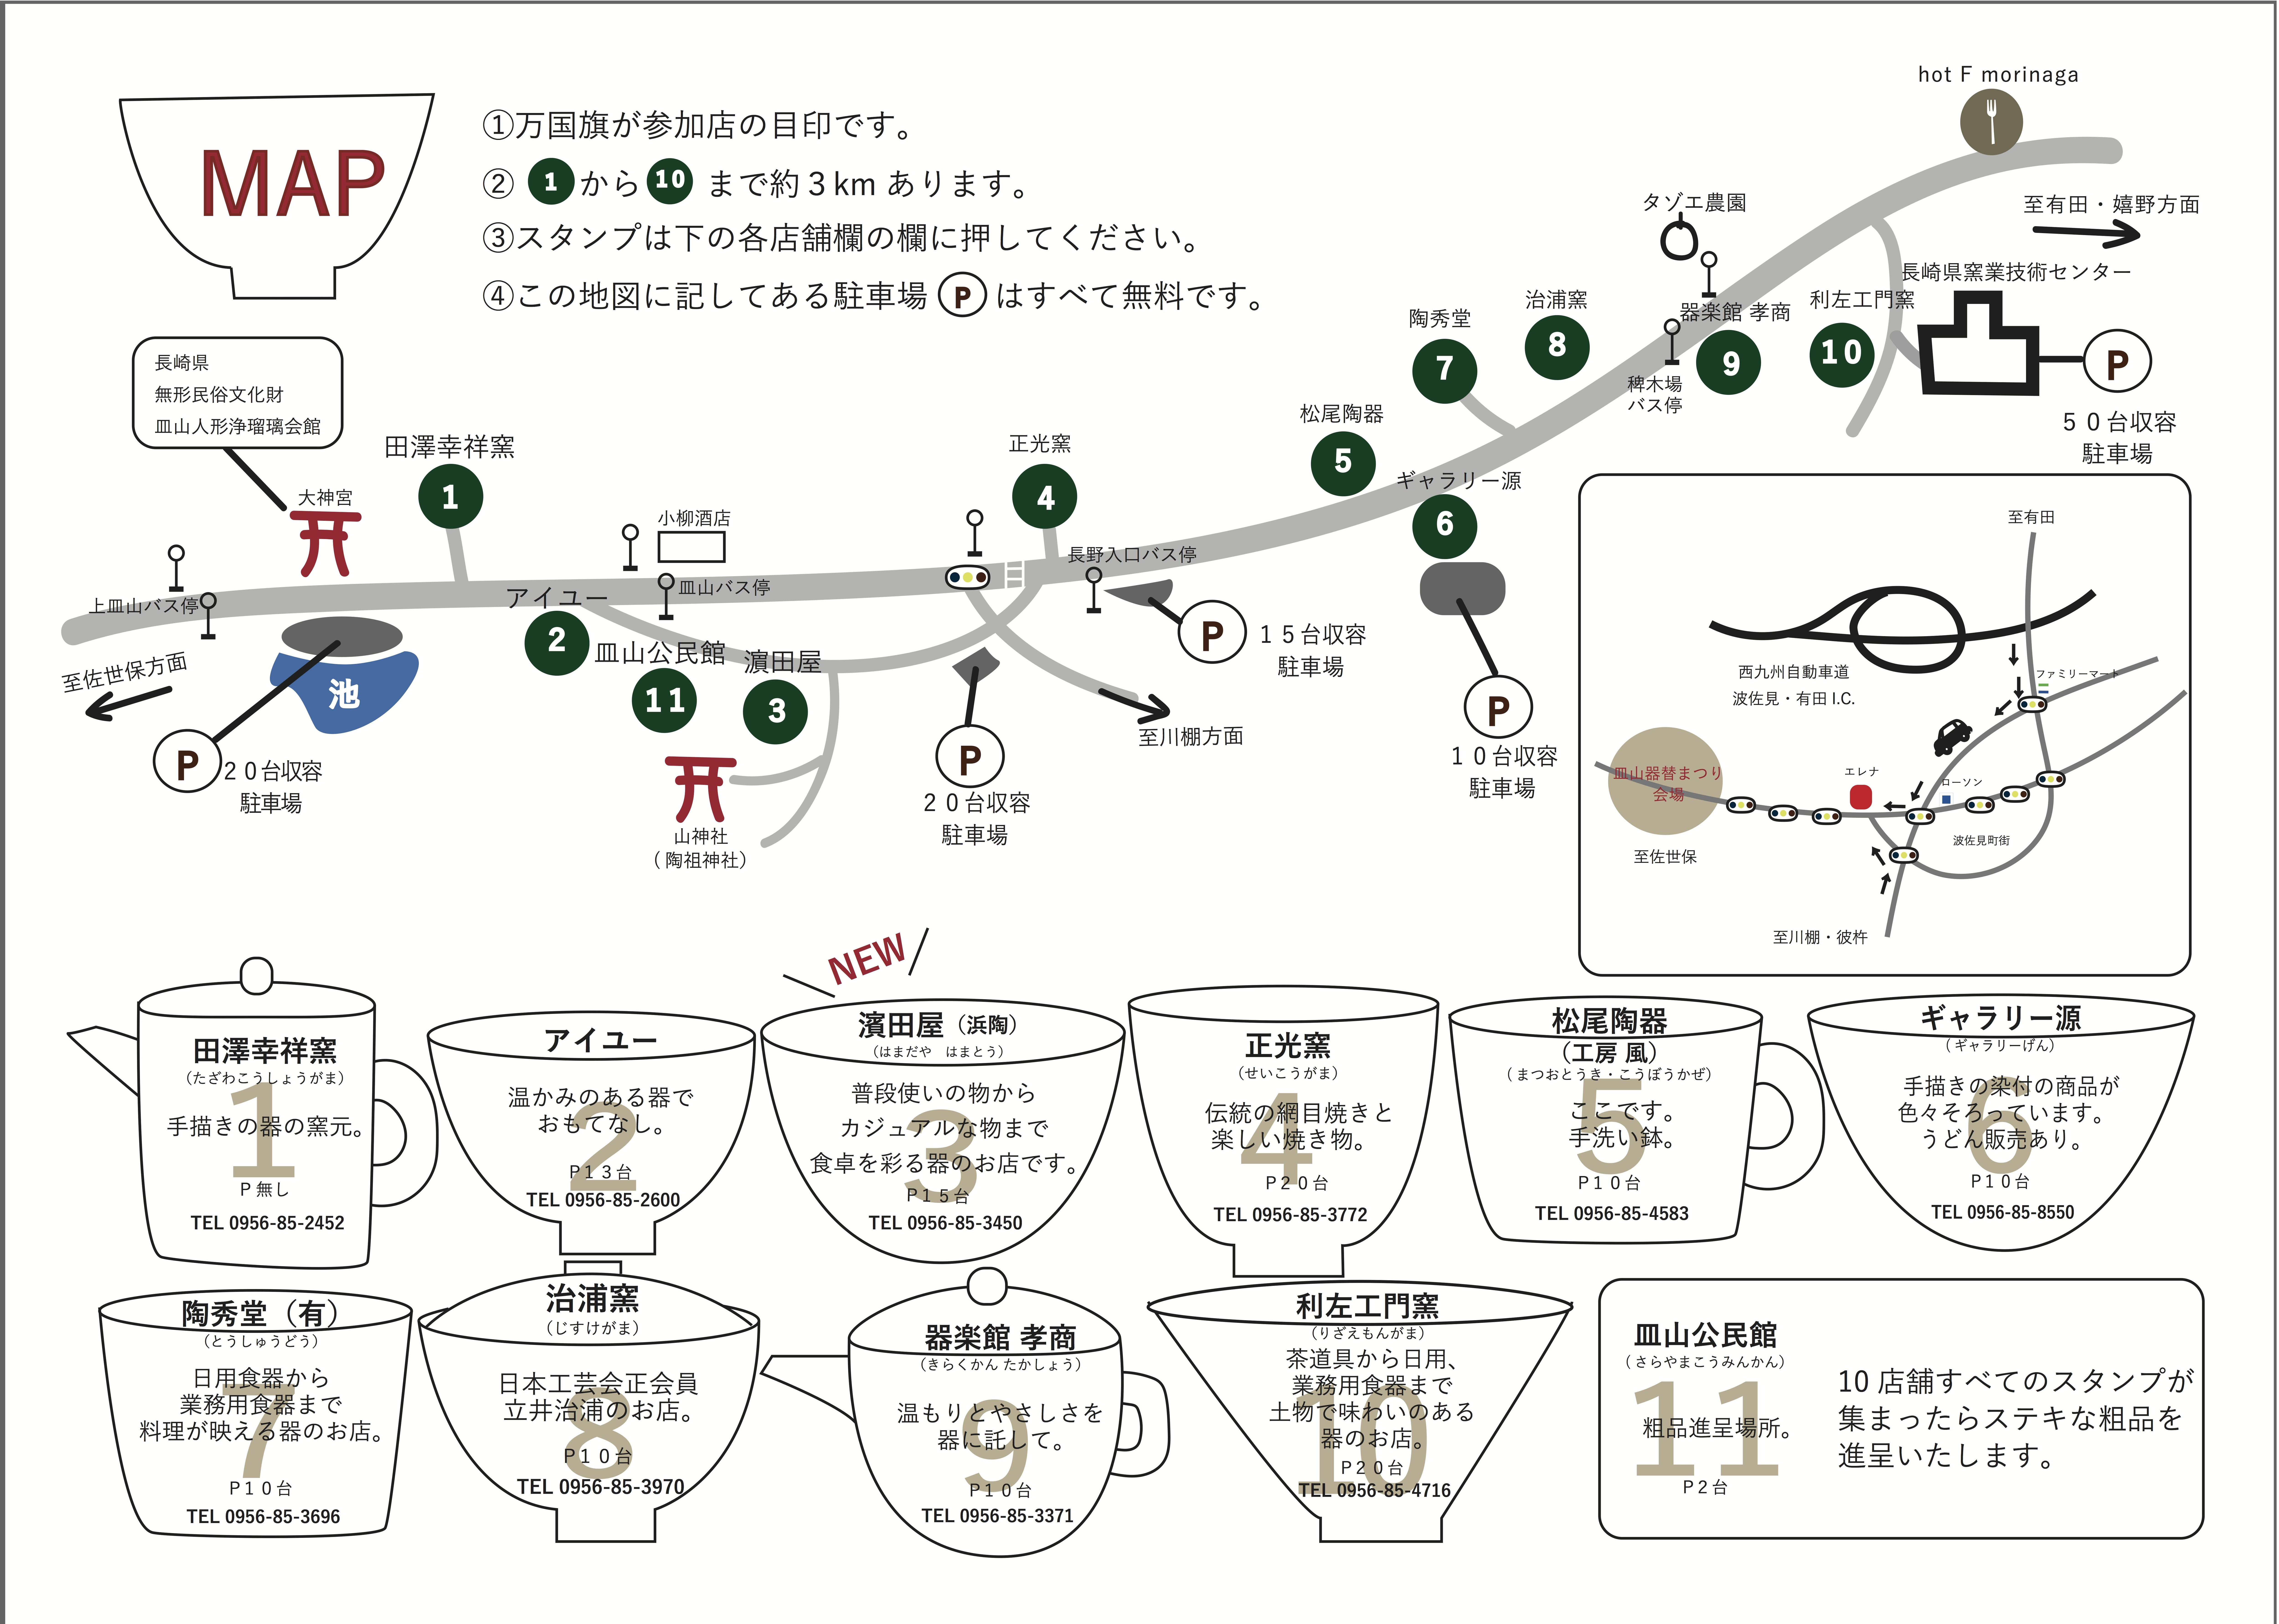 第16回波佐見皿山器替え祭MAP